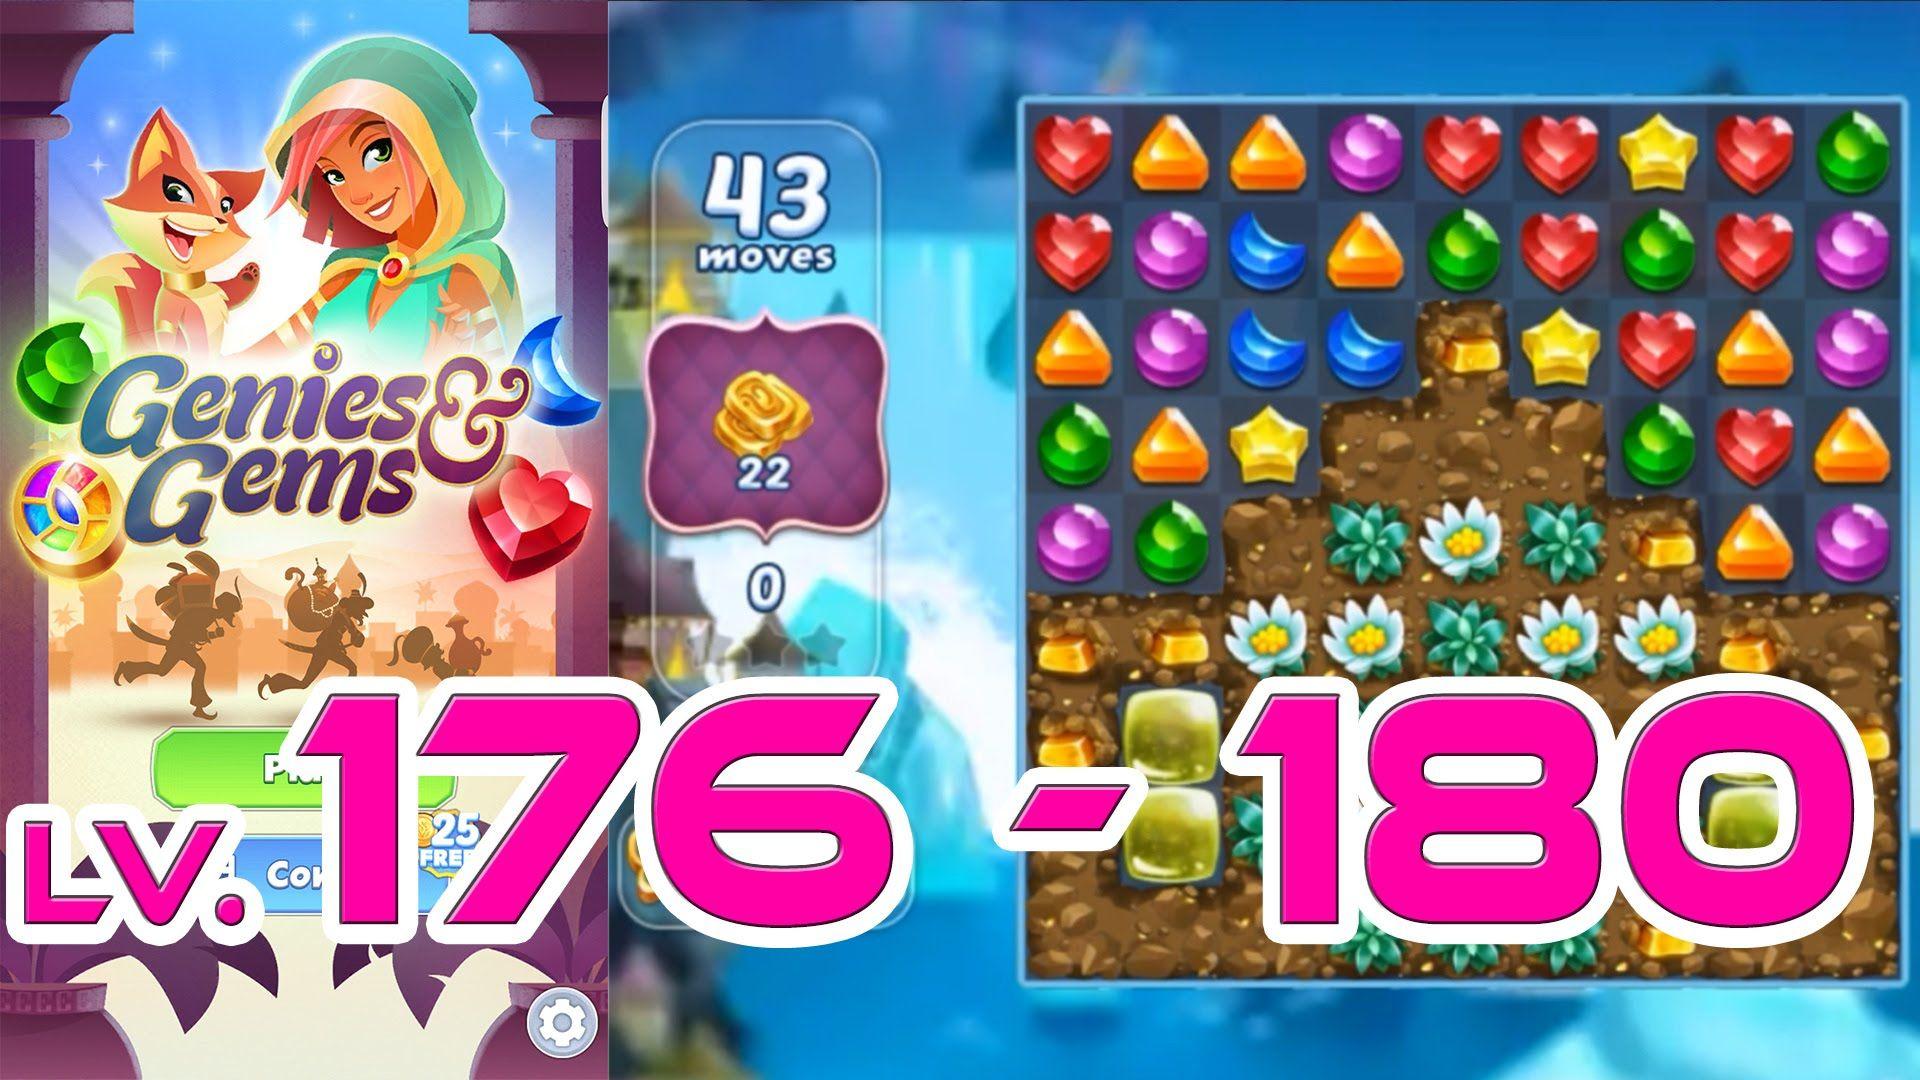 Genies & Gems - Level 176 - 180 (1080p/60fps) | Genies & Gems